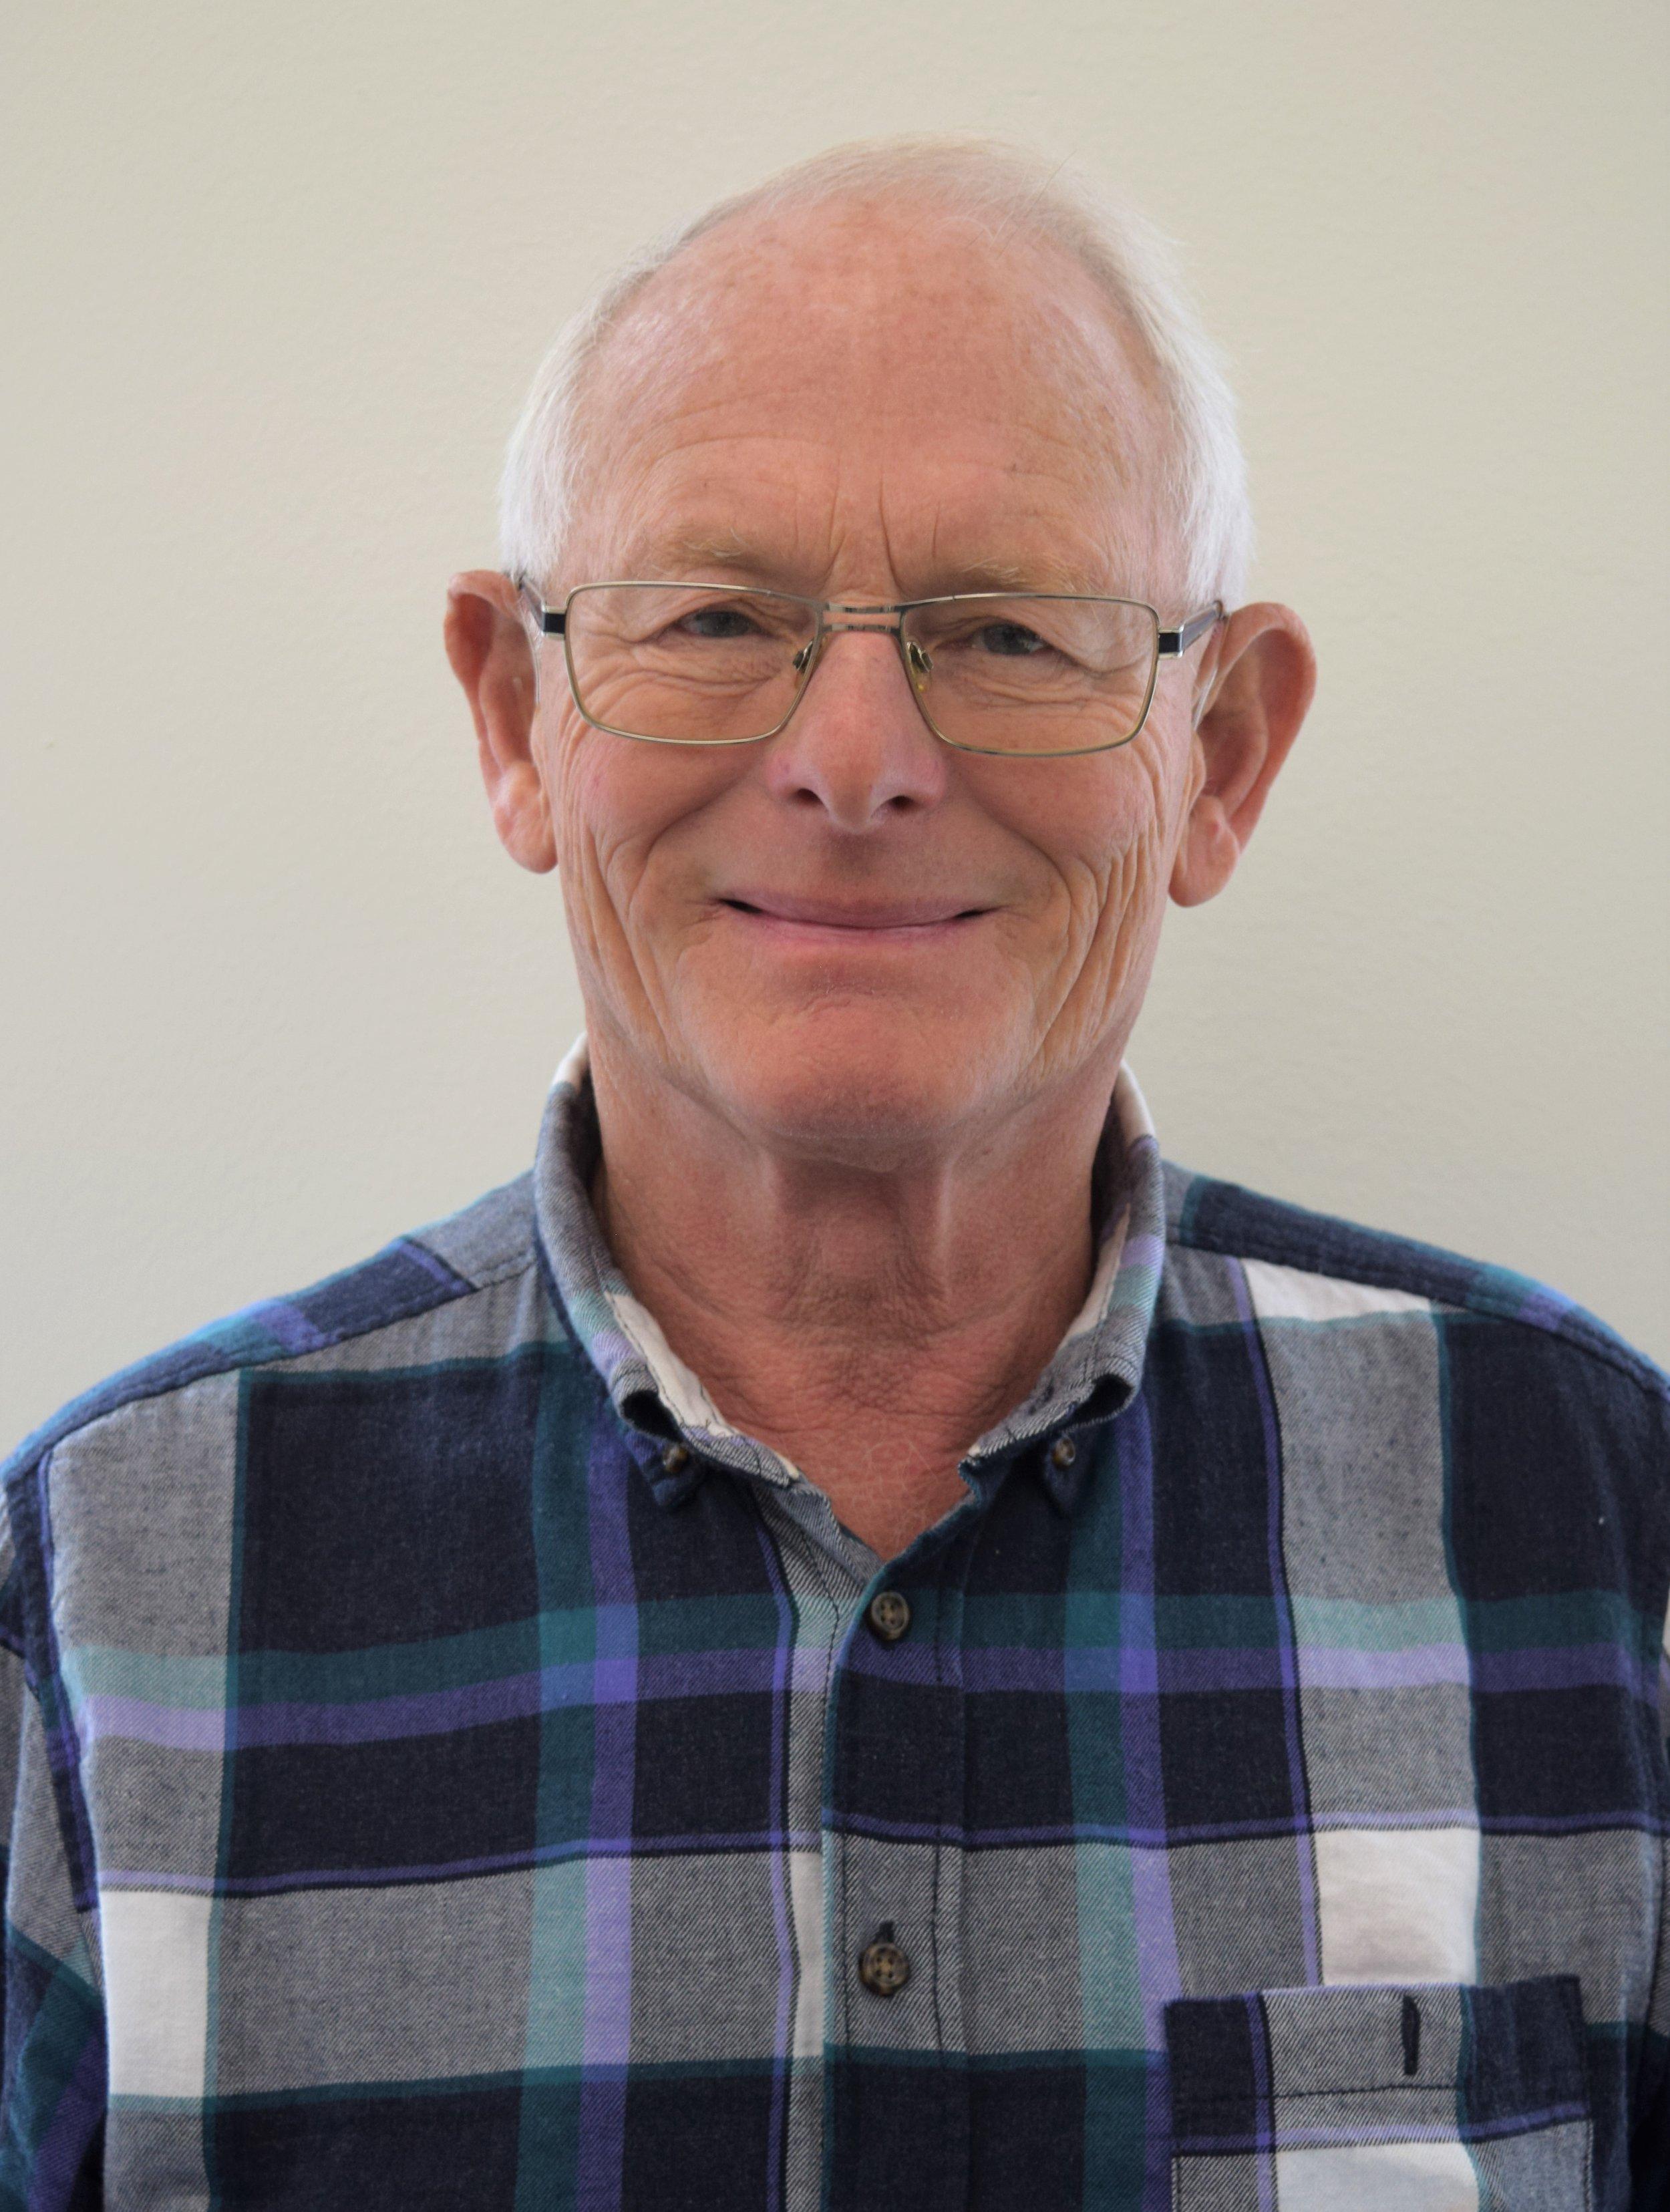 Stefan Hagbard - Styrelseordförande